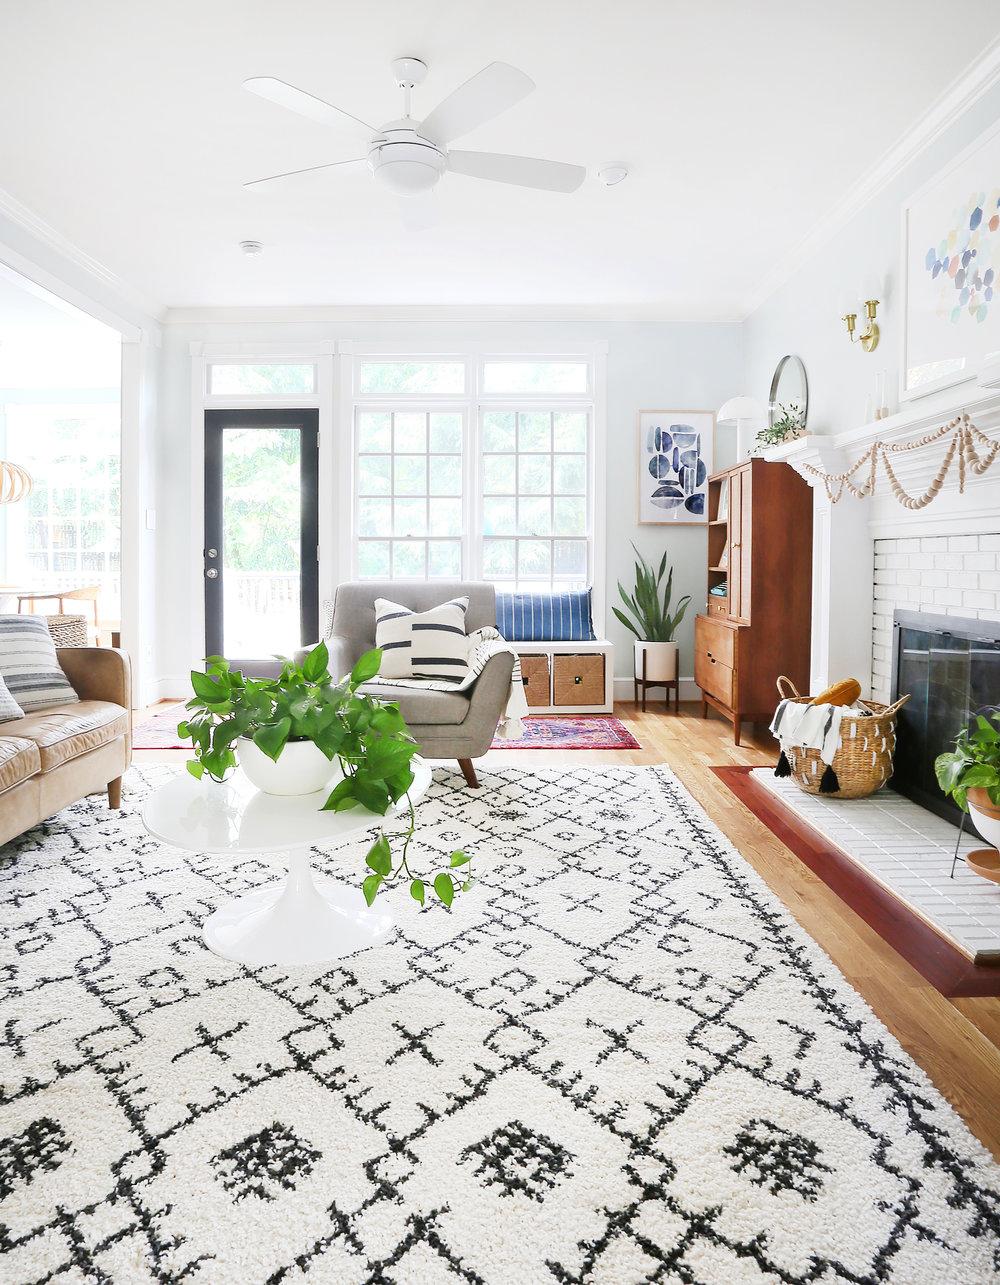 Rug   /   Coffee Table   /   Lumbar Pillow   /   Leather Sofa   /   Planter